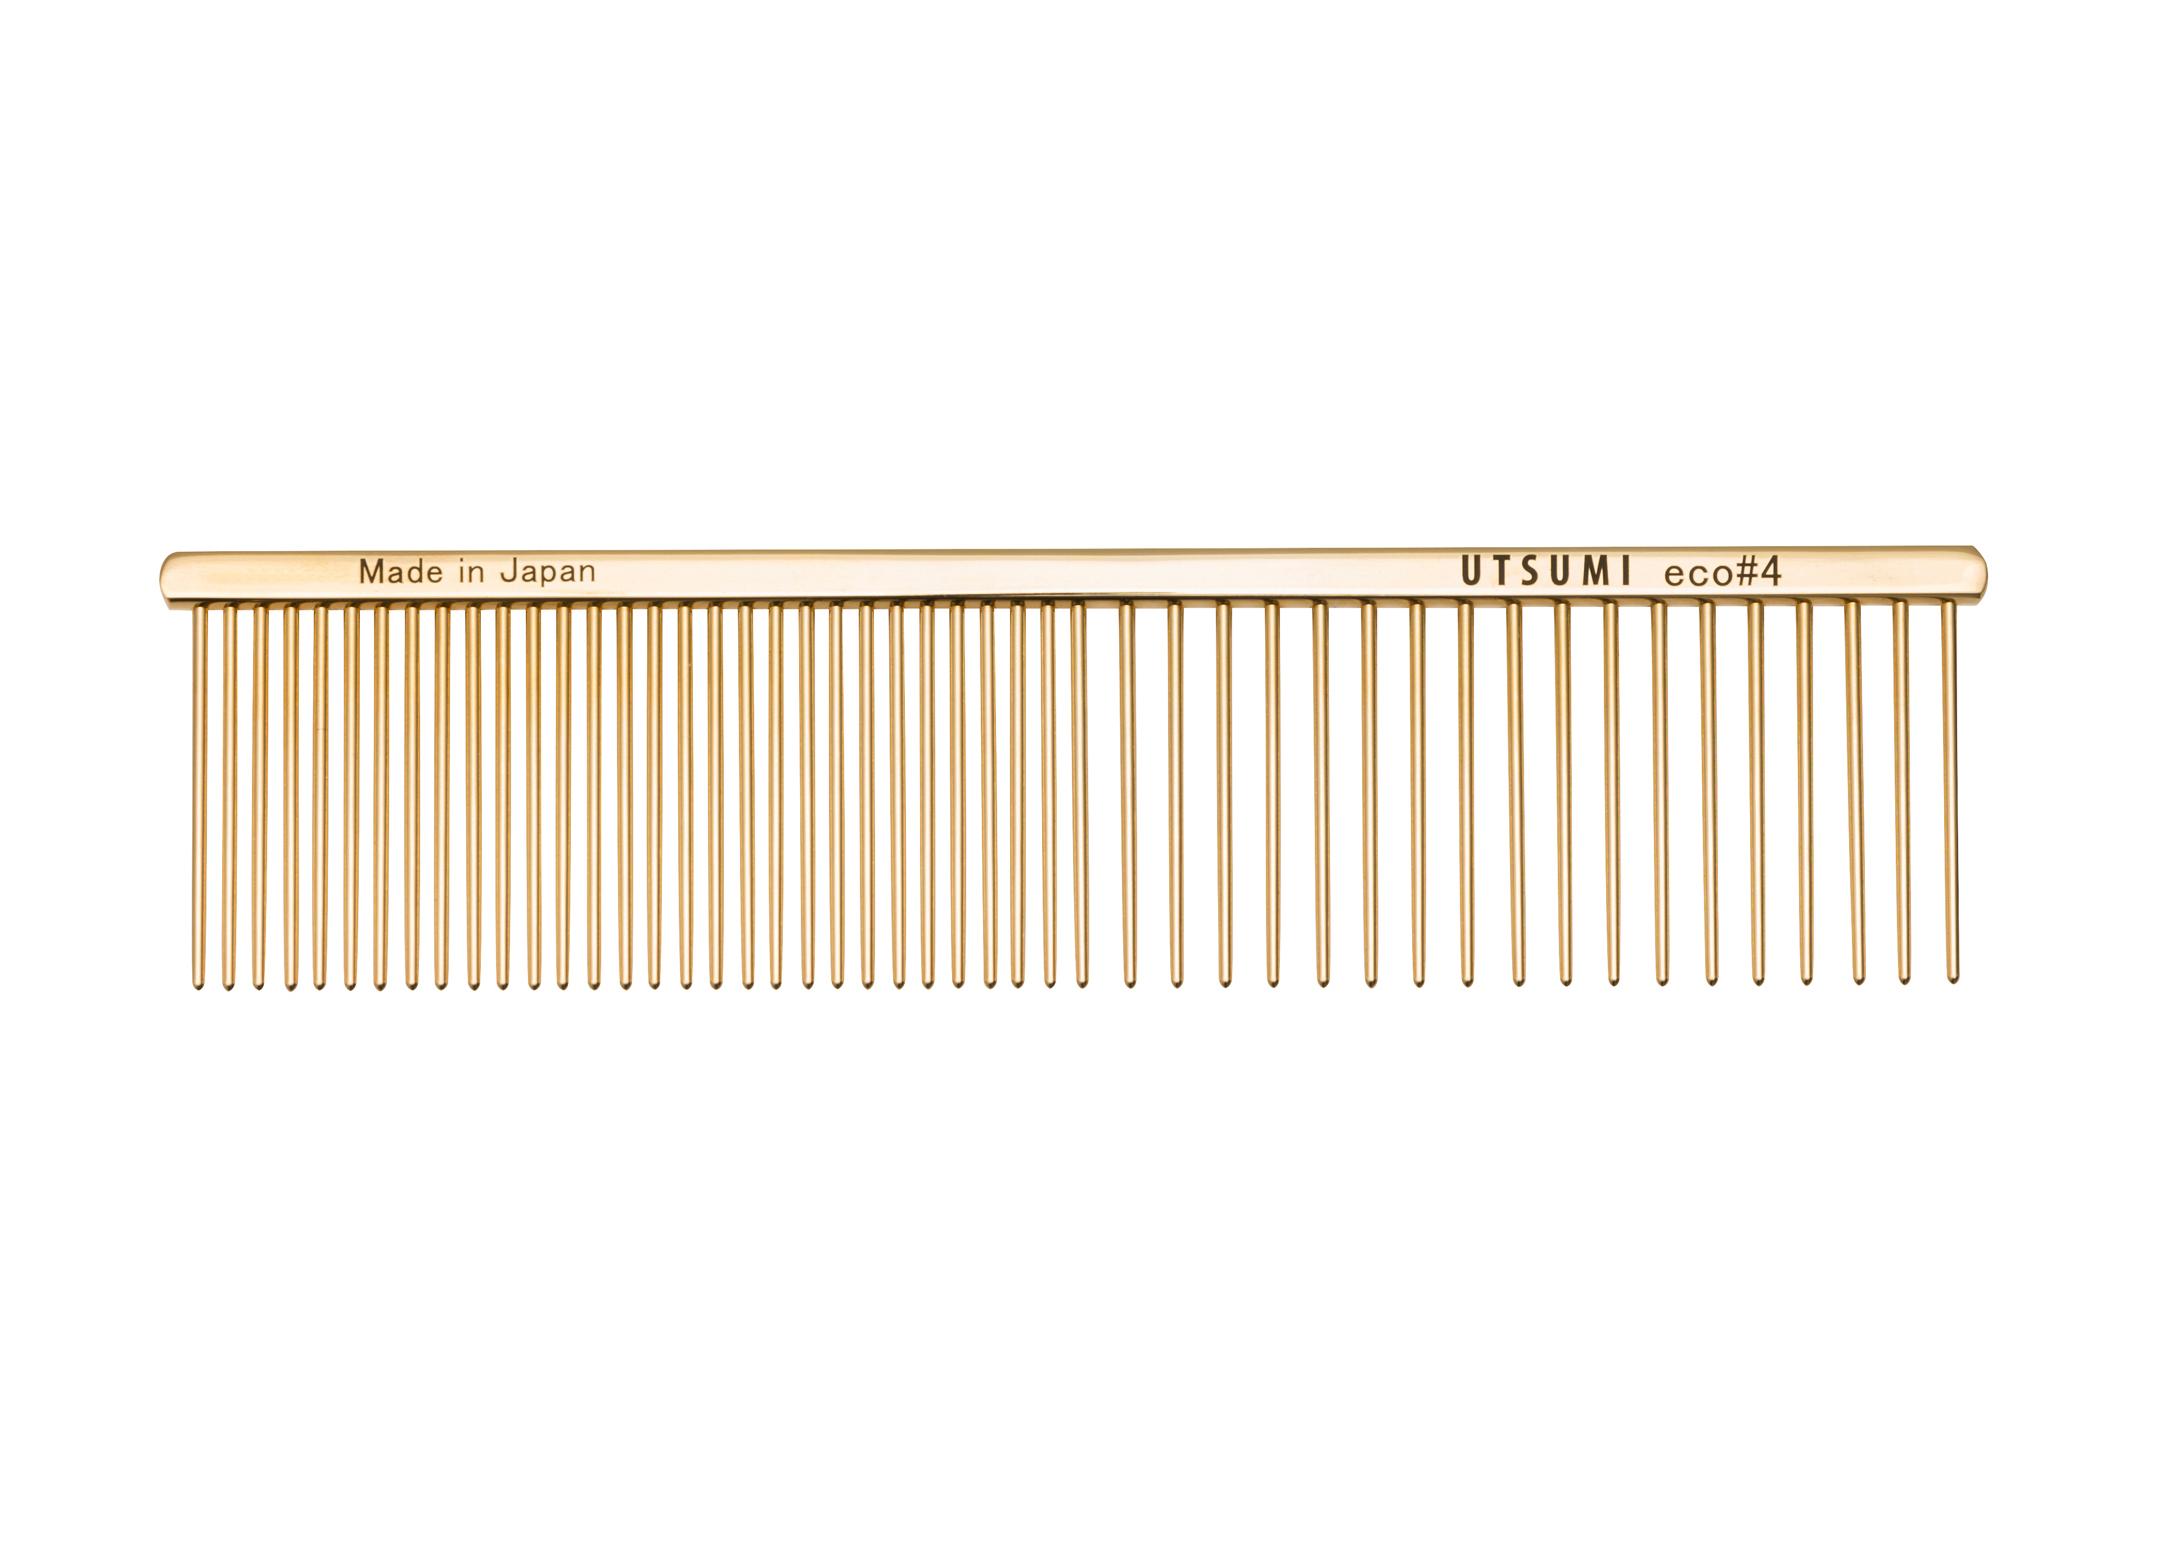 Utsumi Eco#4 Kam Goud 19cm, 4cm lange Tanden Kam